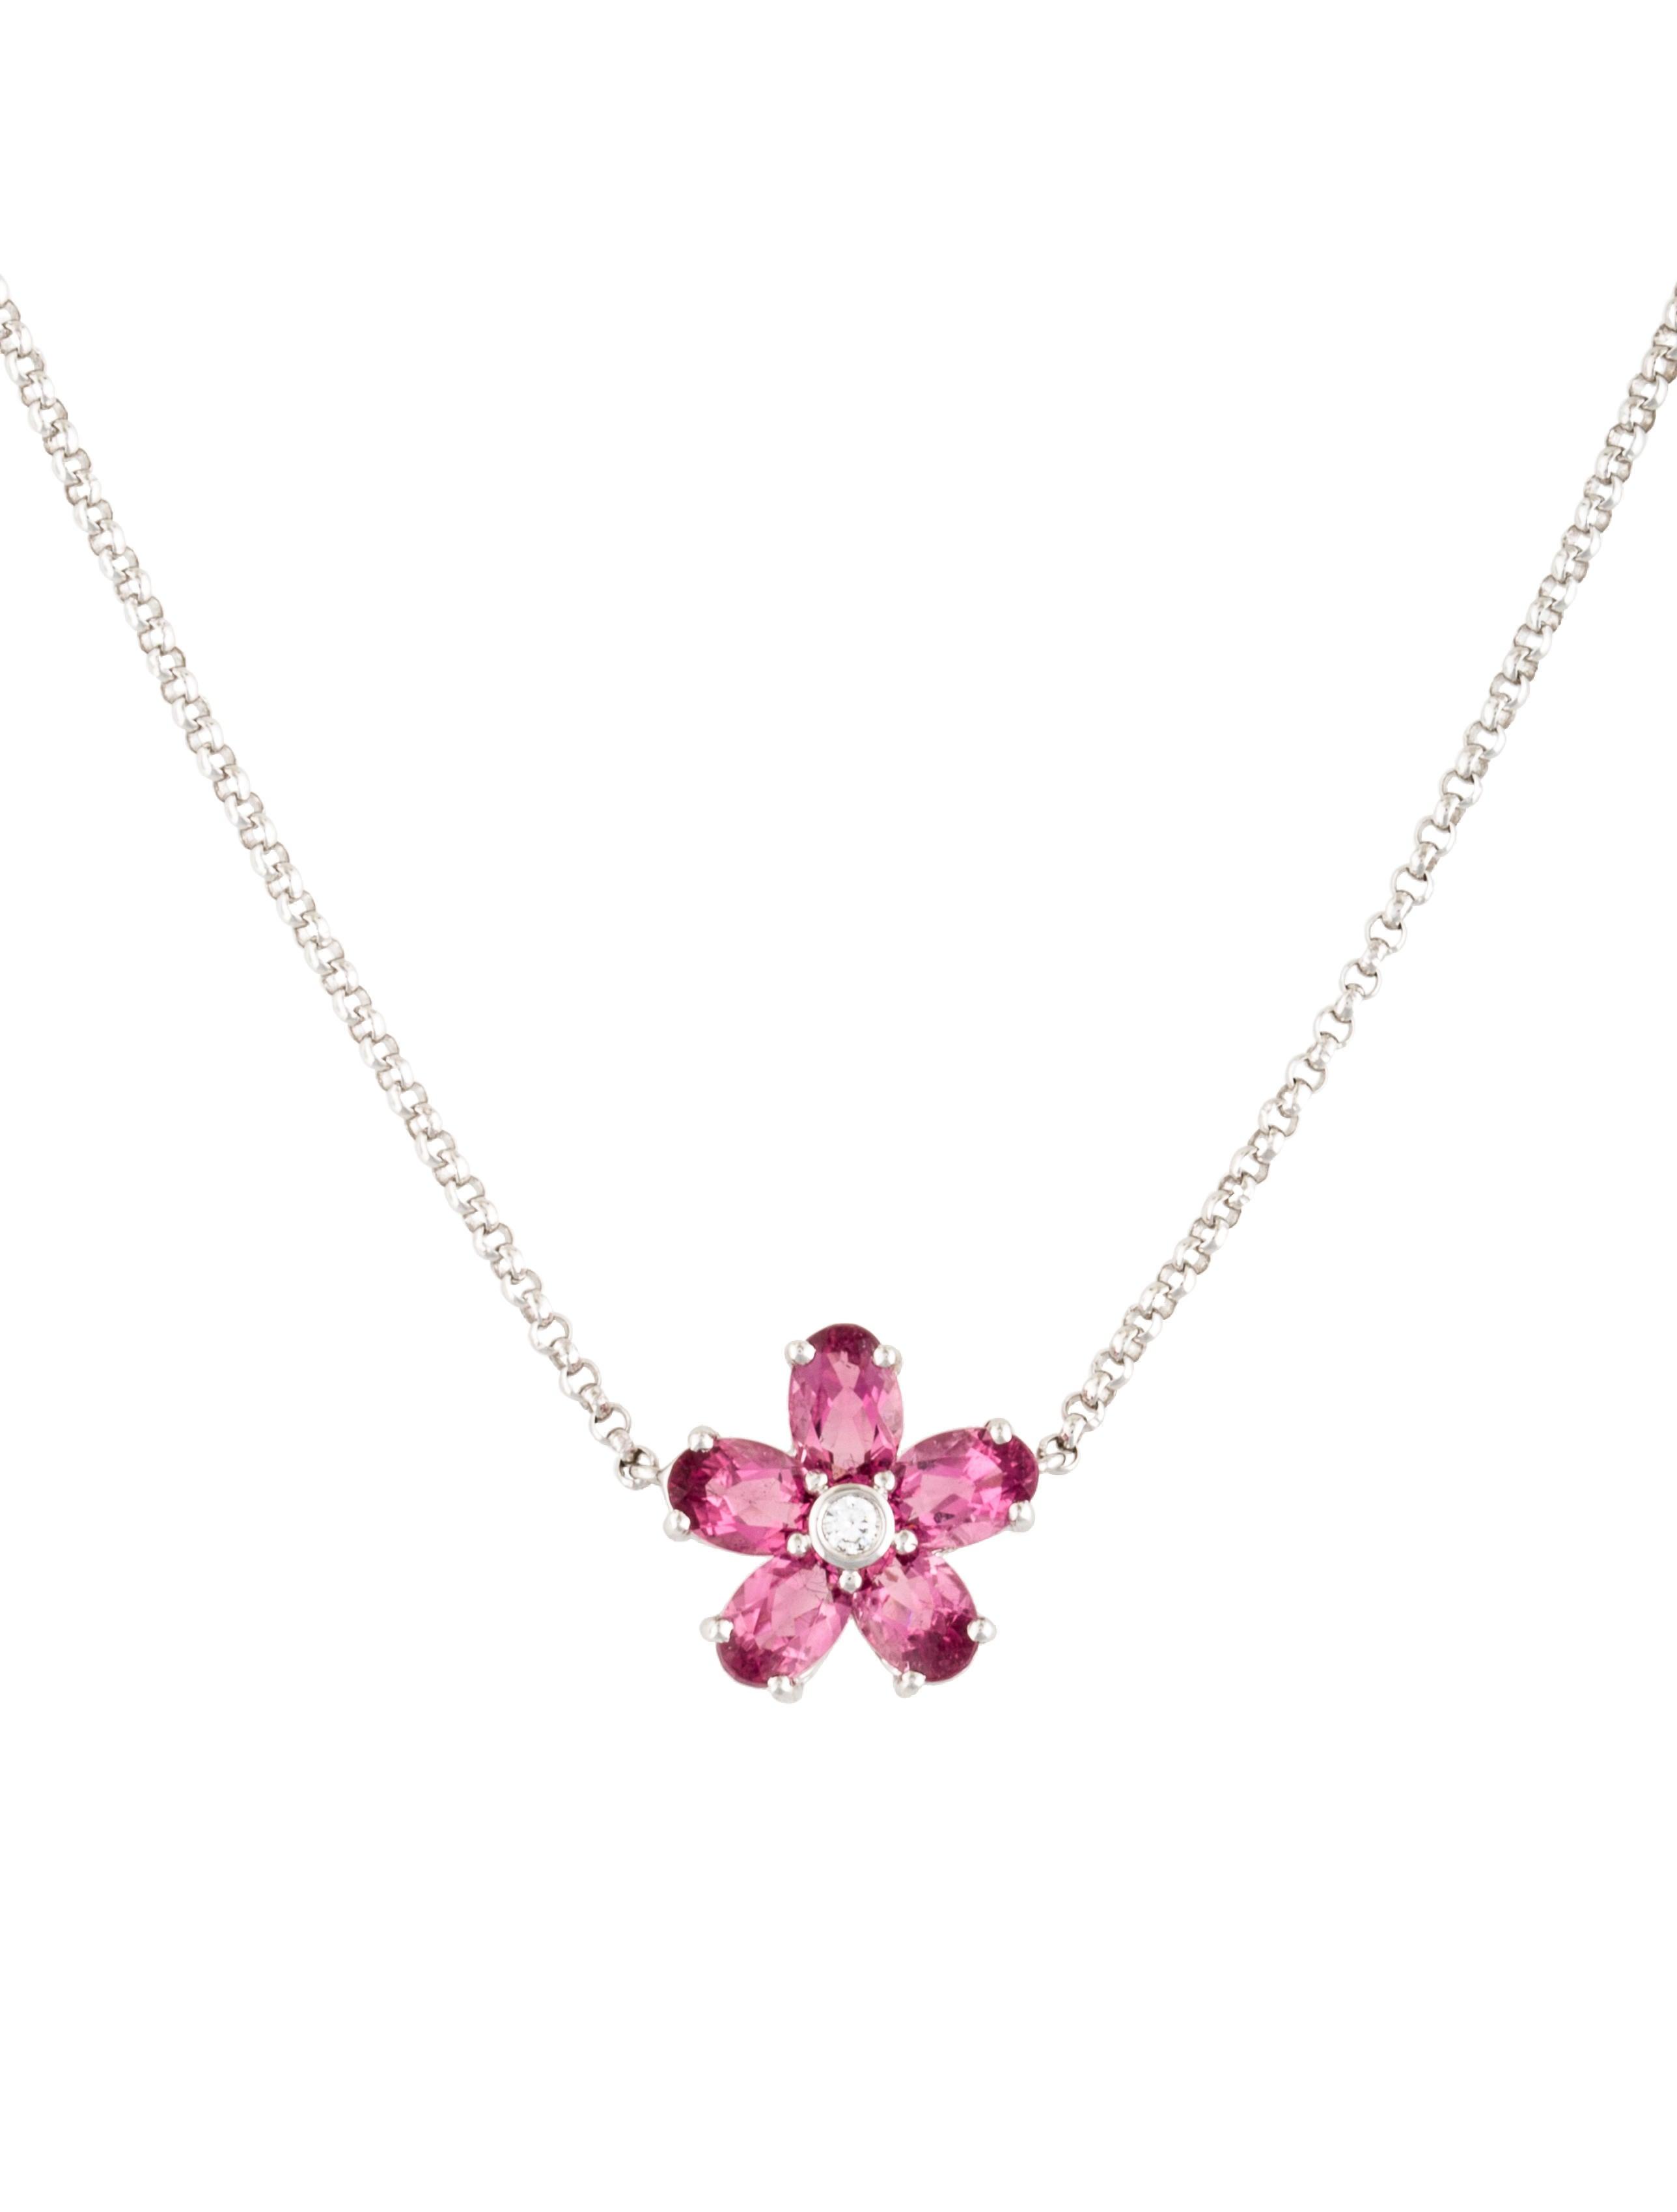 18k pink tourmaline diamond flower pendant necklace. Black Bedroom Furniture Sets. Home Design Ideas